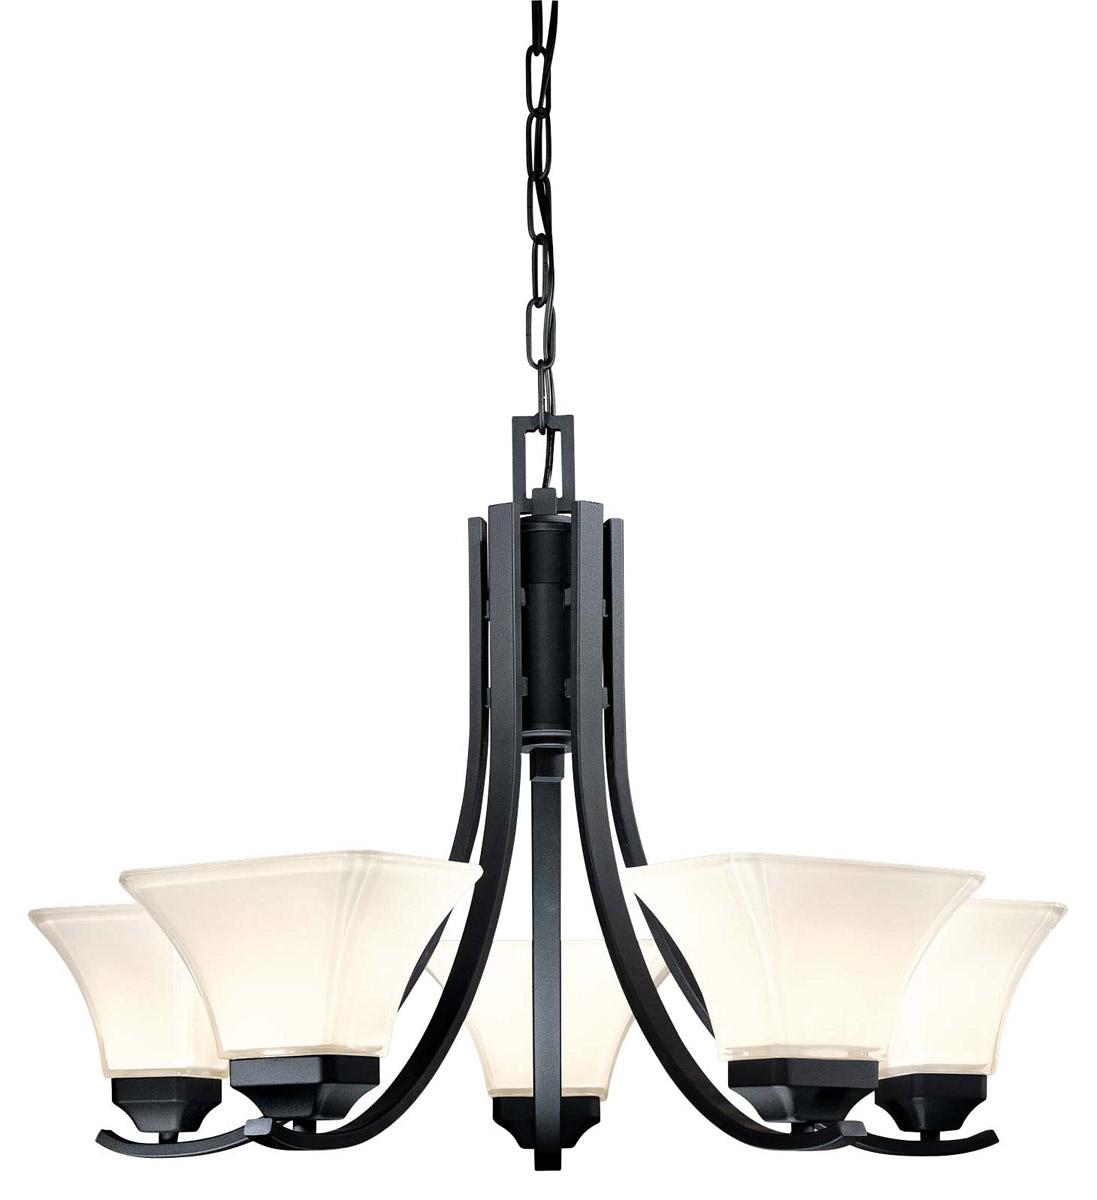 Minka Lavery Agilis 5-Light Chandelier in Black